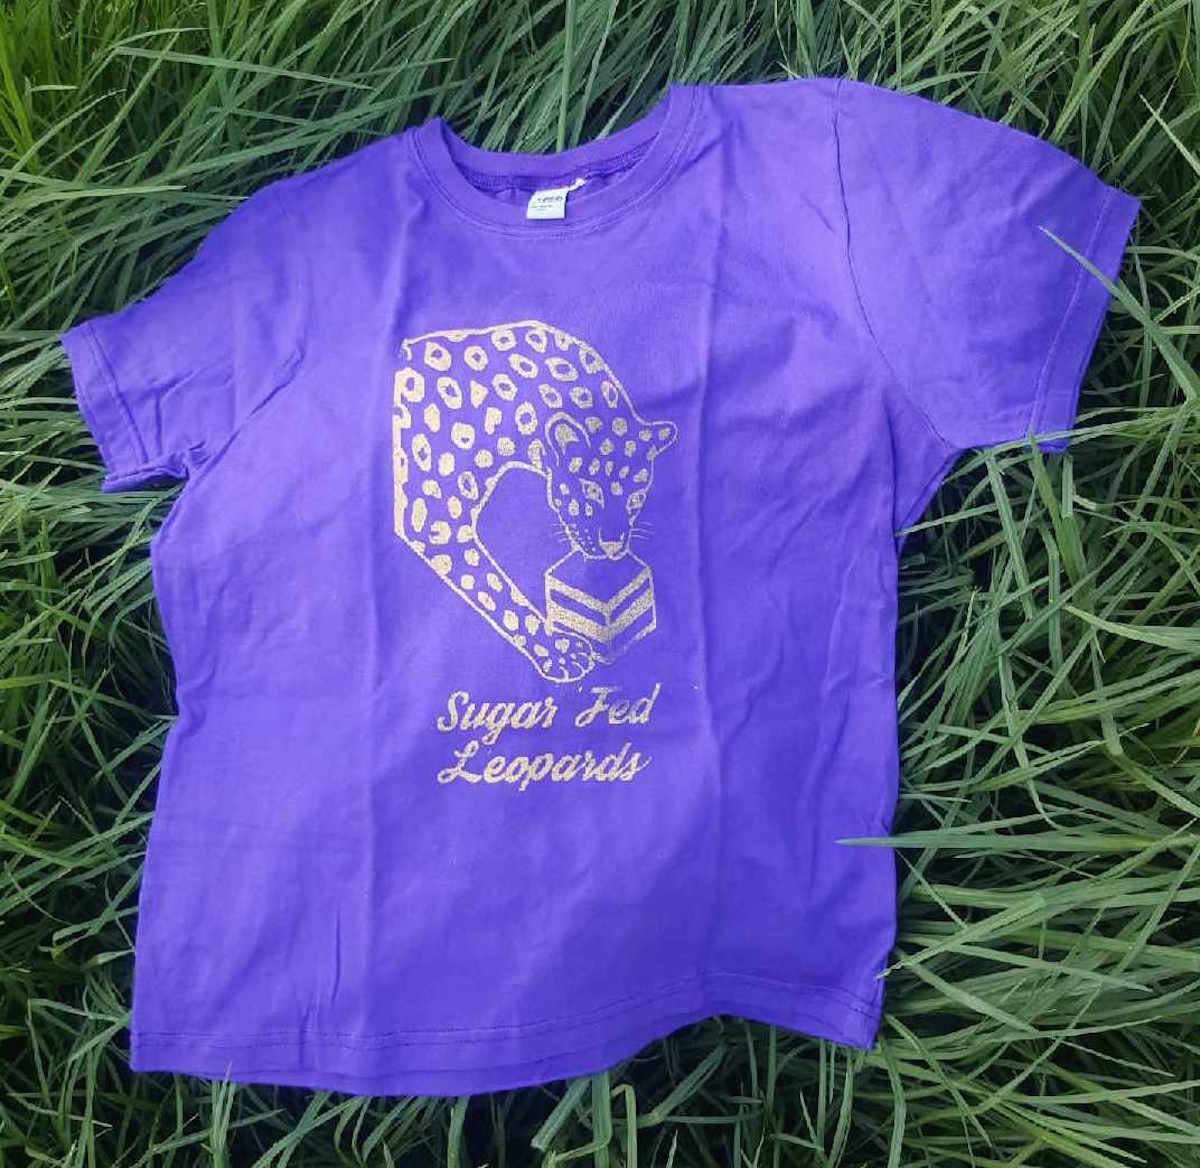 Gold Print On Purple T Shirt Sugar Fed Leopards